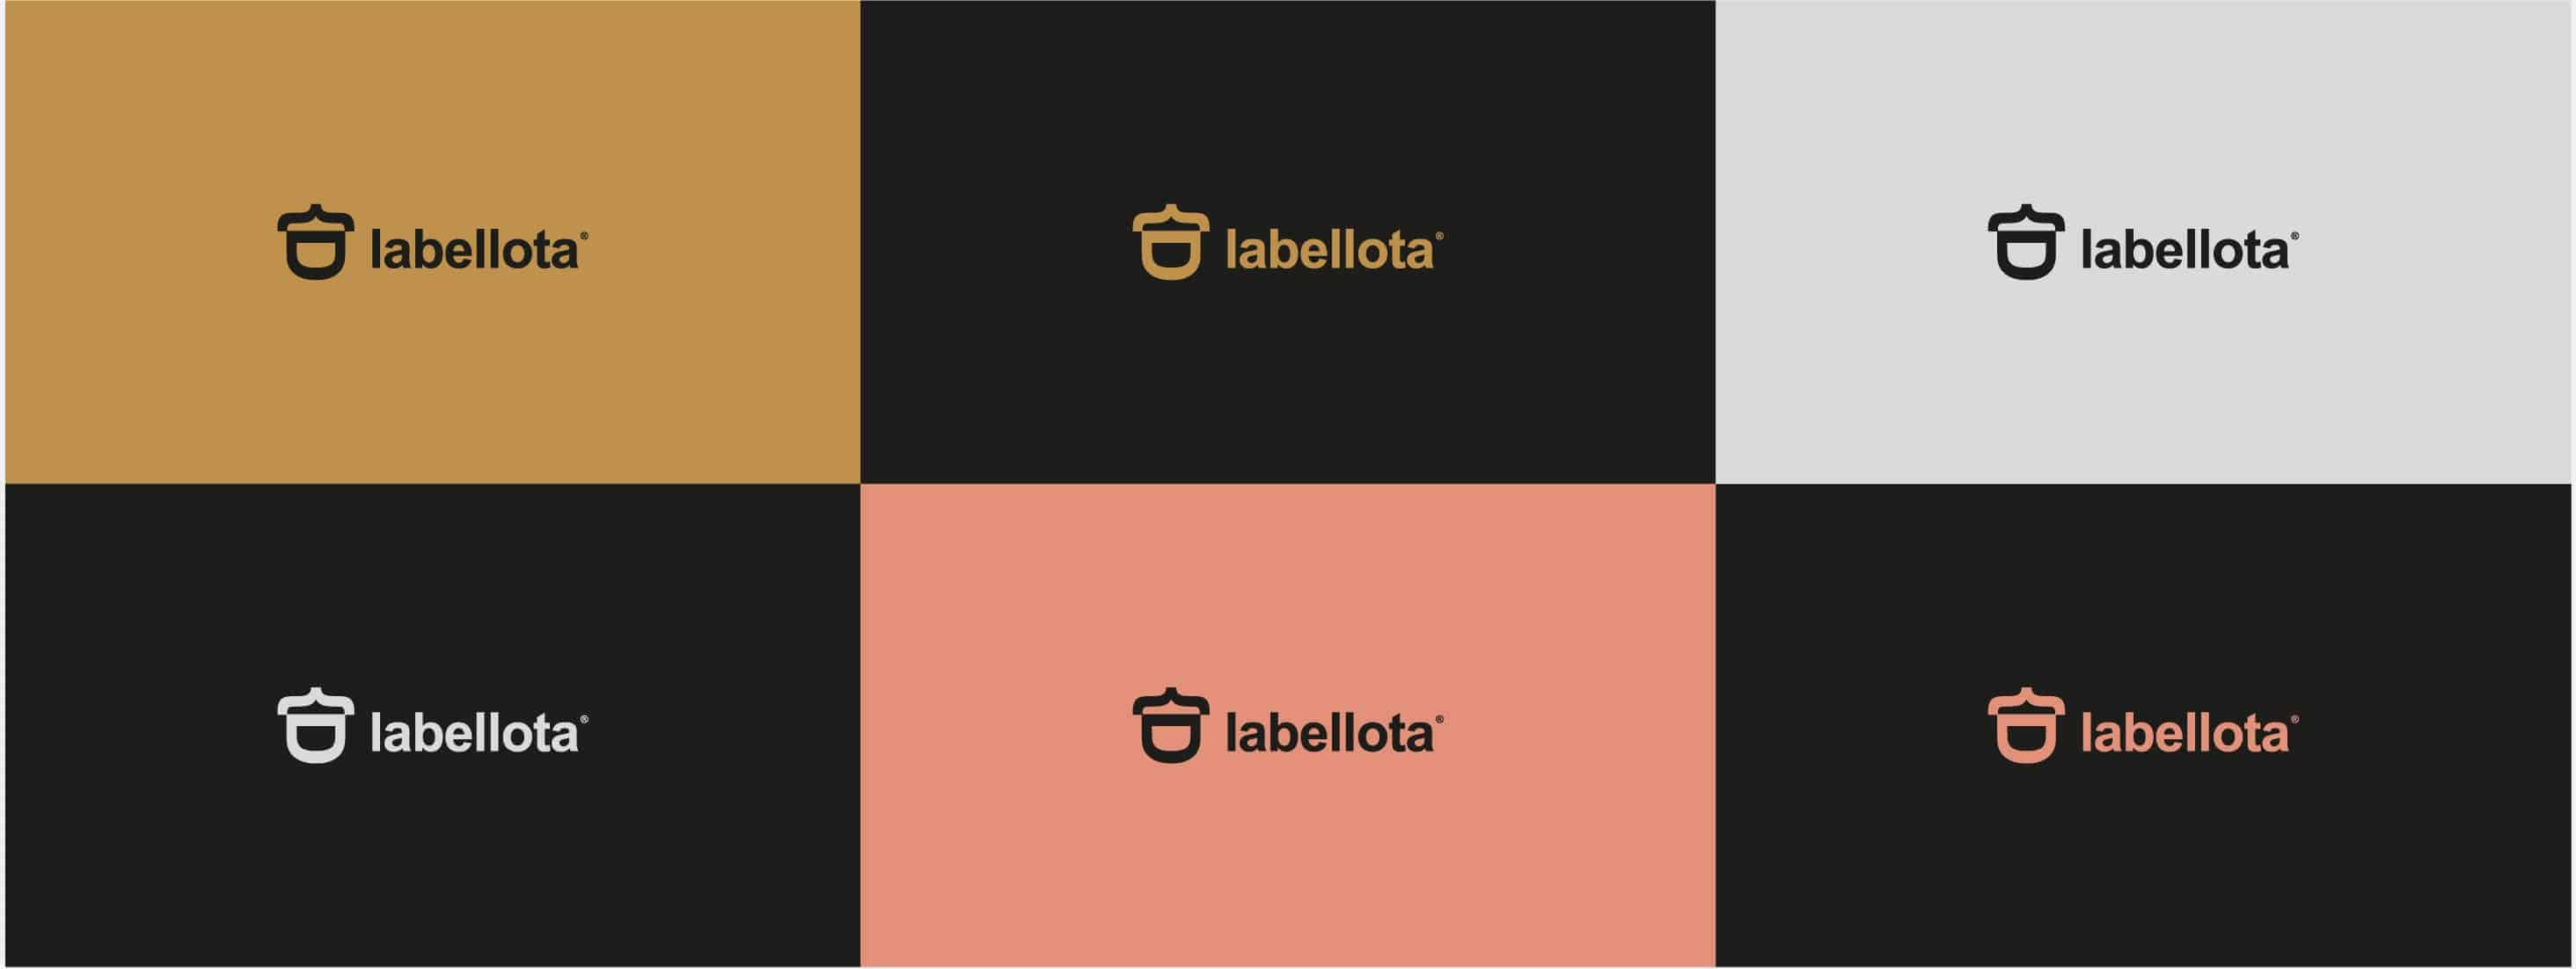 labellota branding